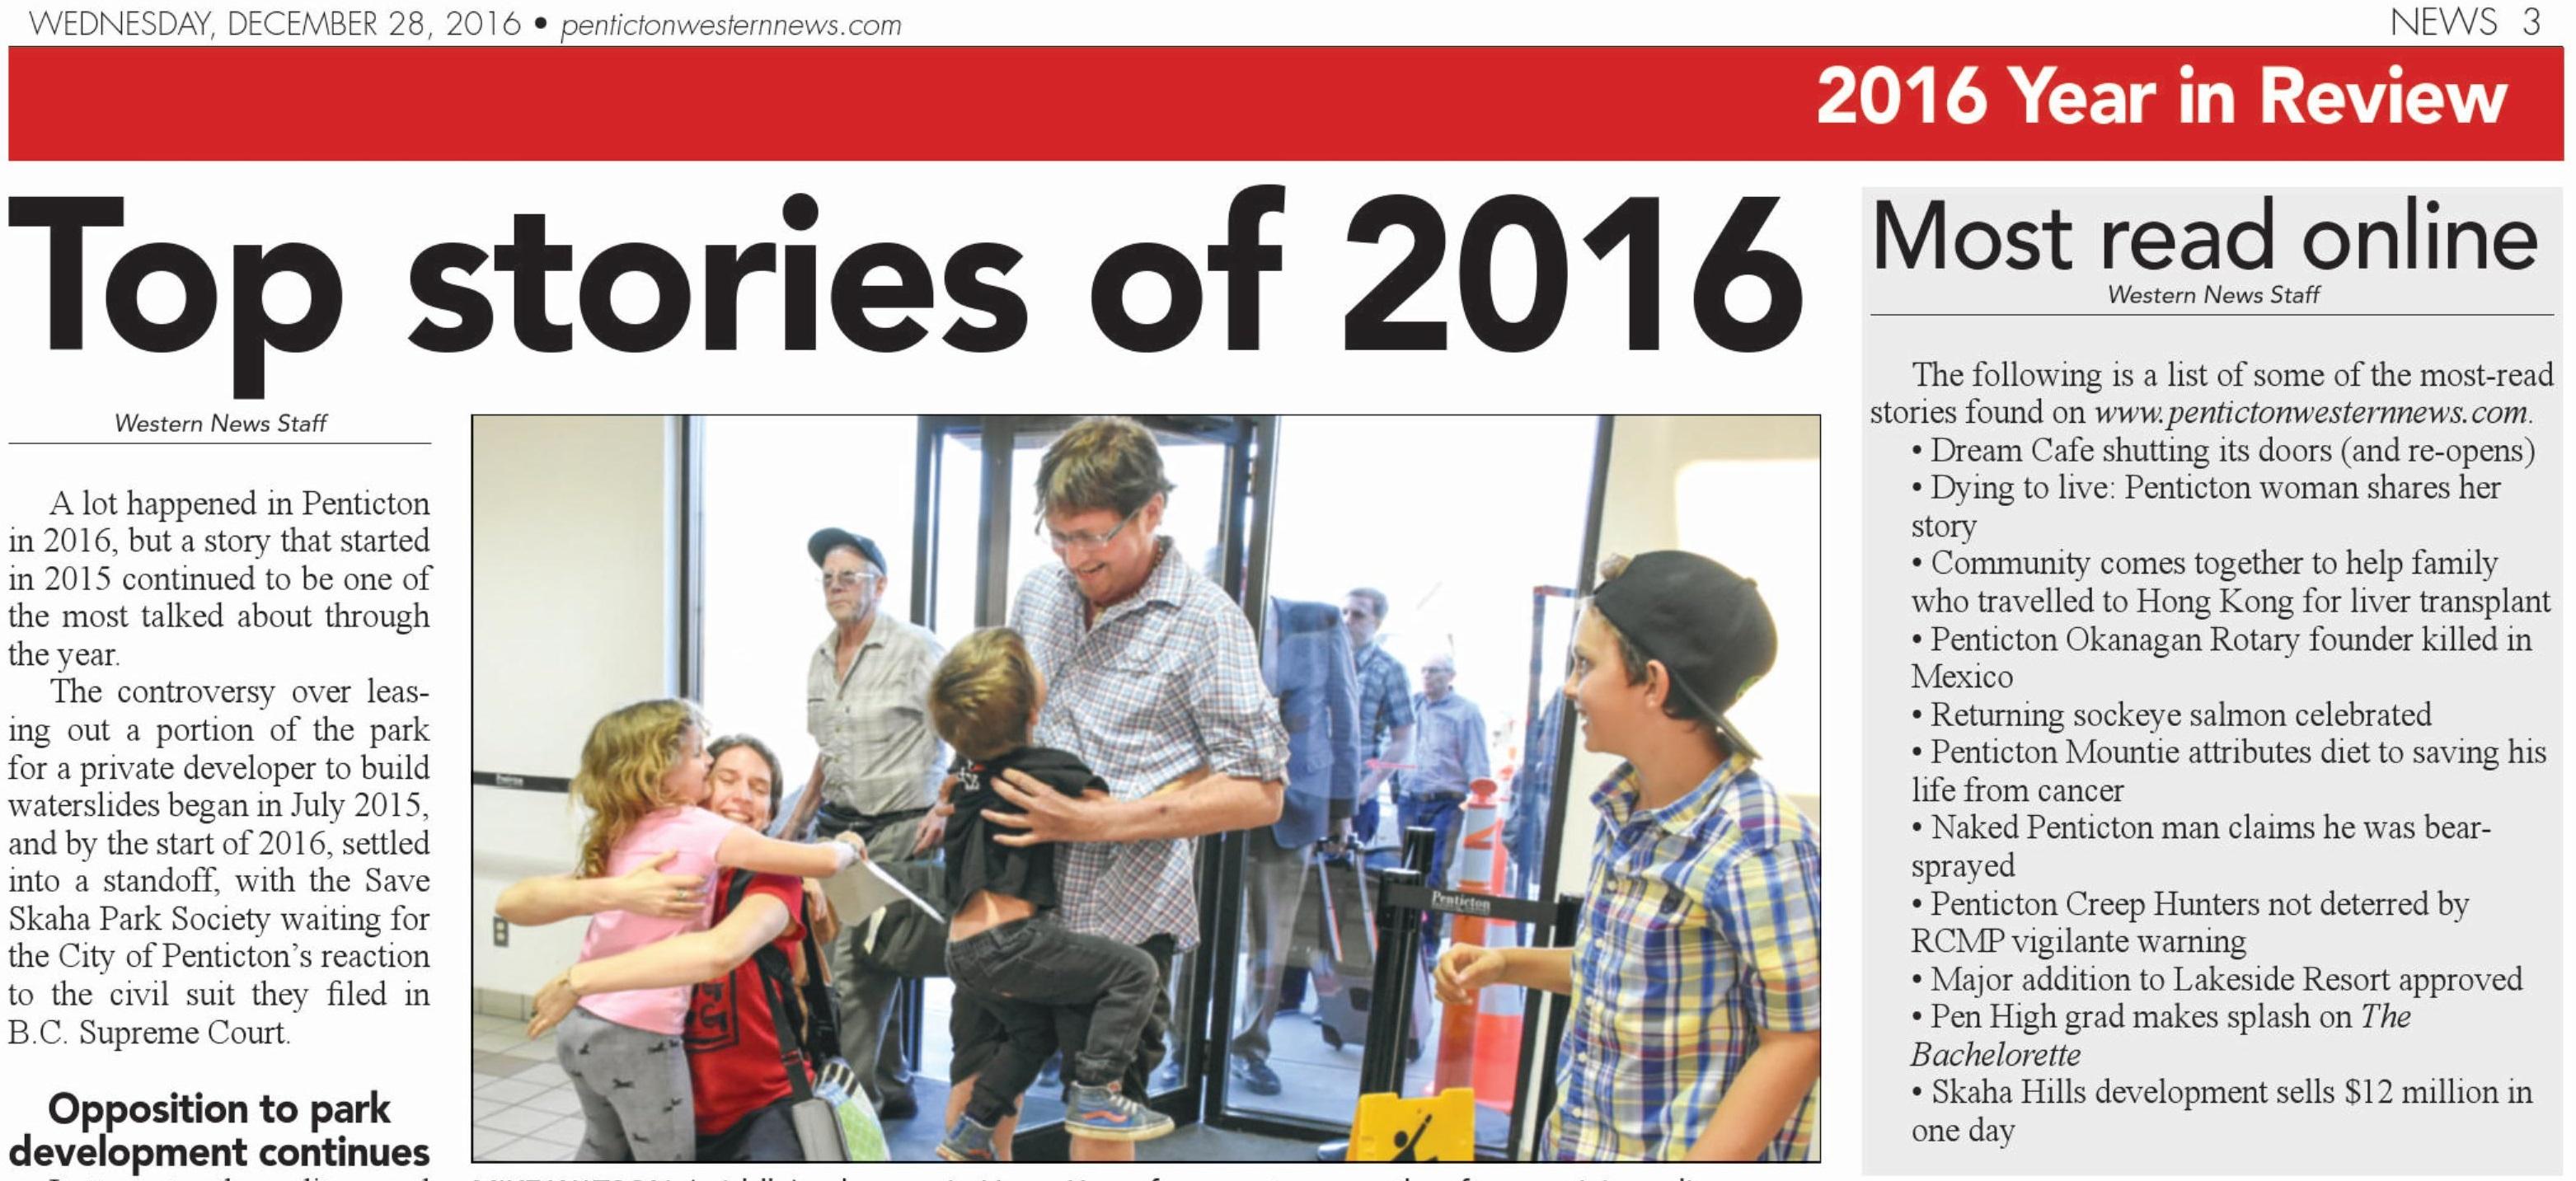 Skaha Hills makes Penticton Western New's top online ...